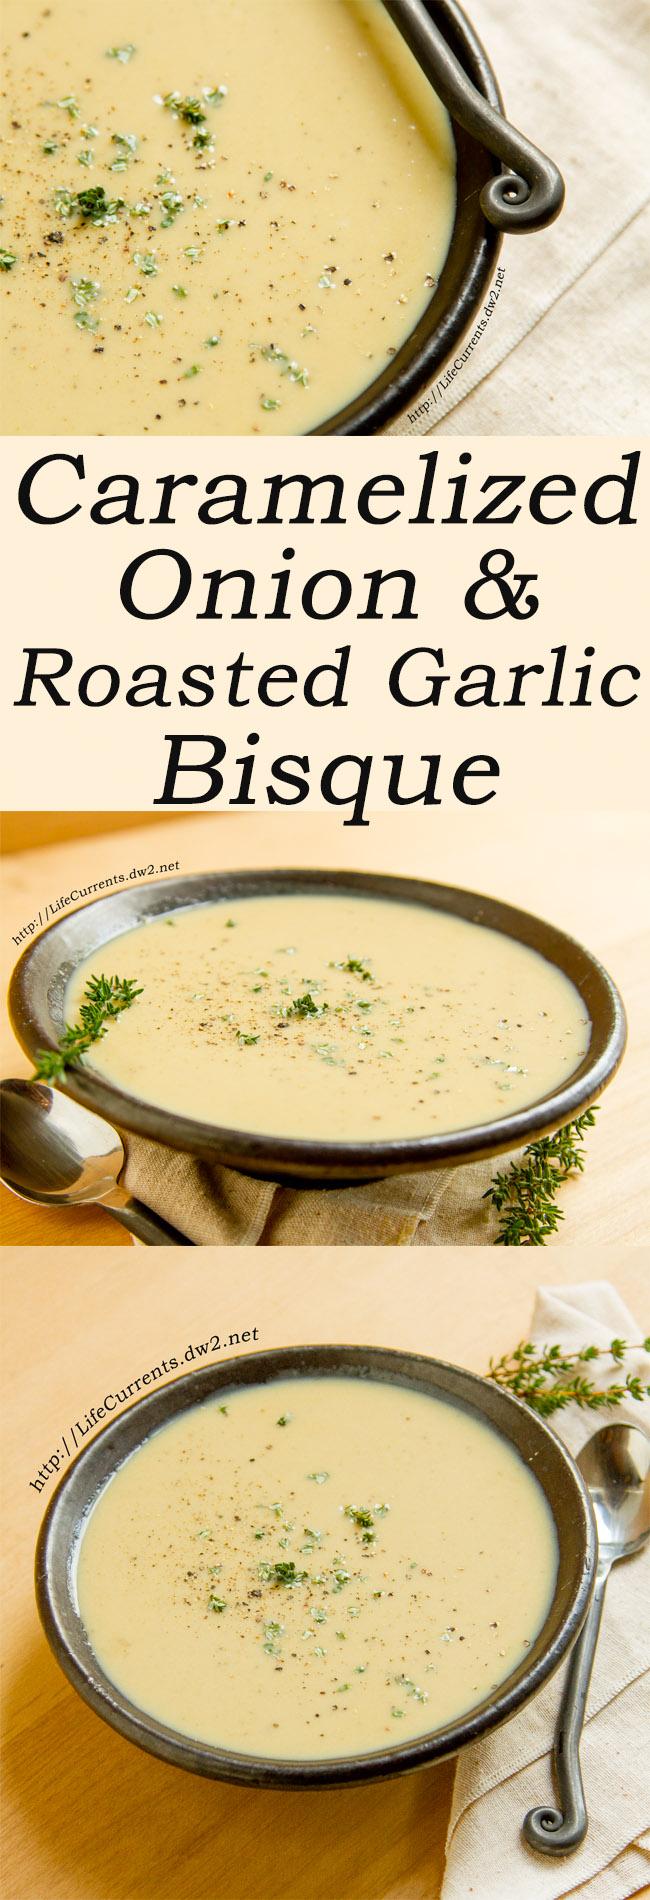 Caramelized Onion Roasted Garlic Bisque #soup #garlic #comfortfood